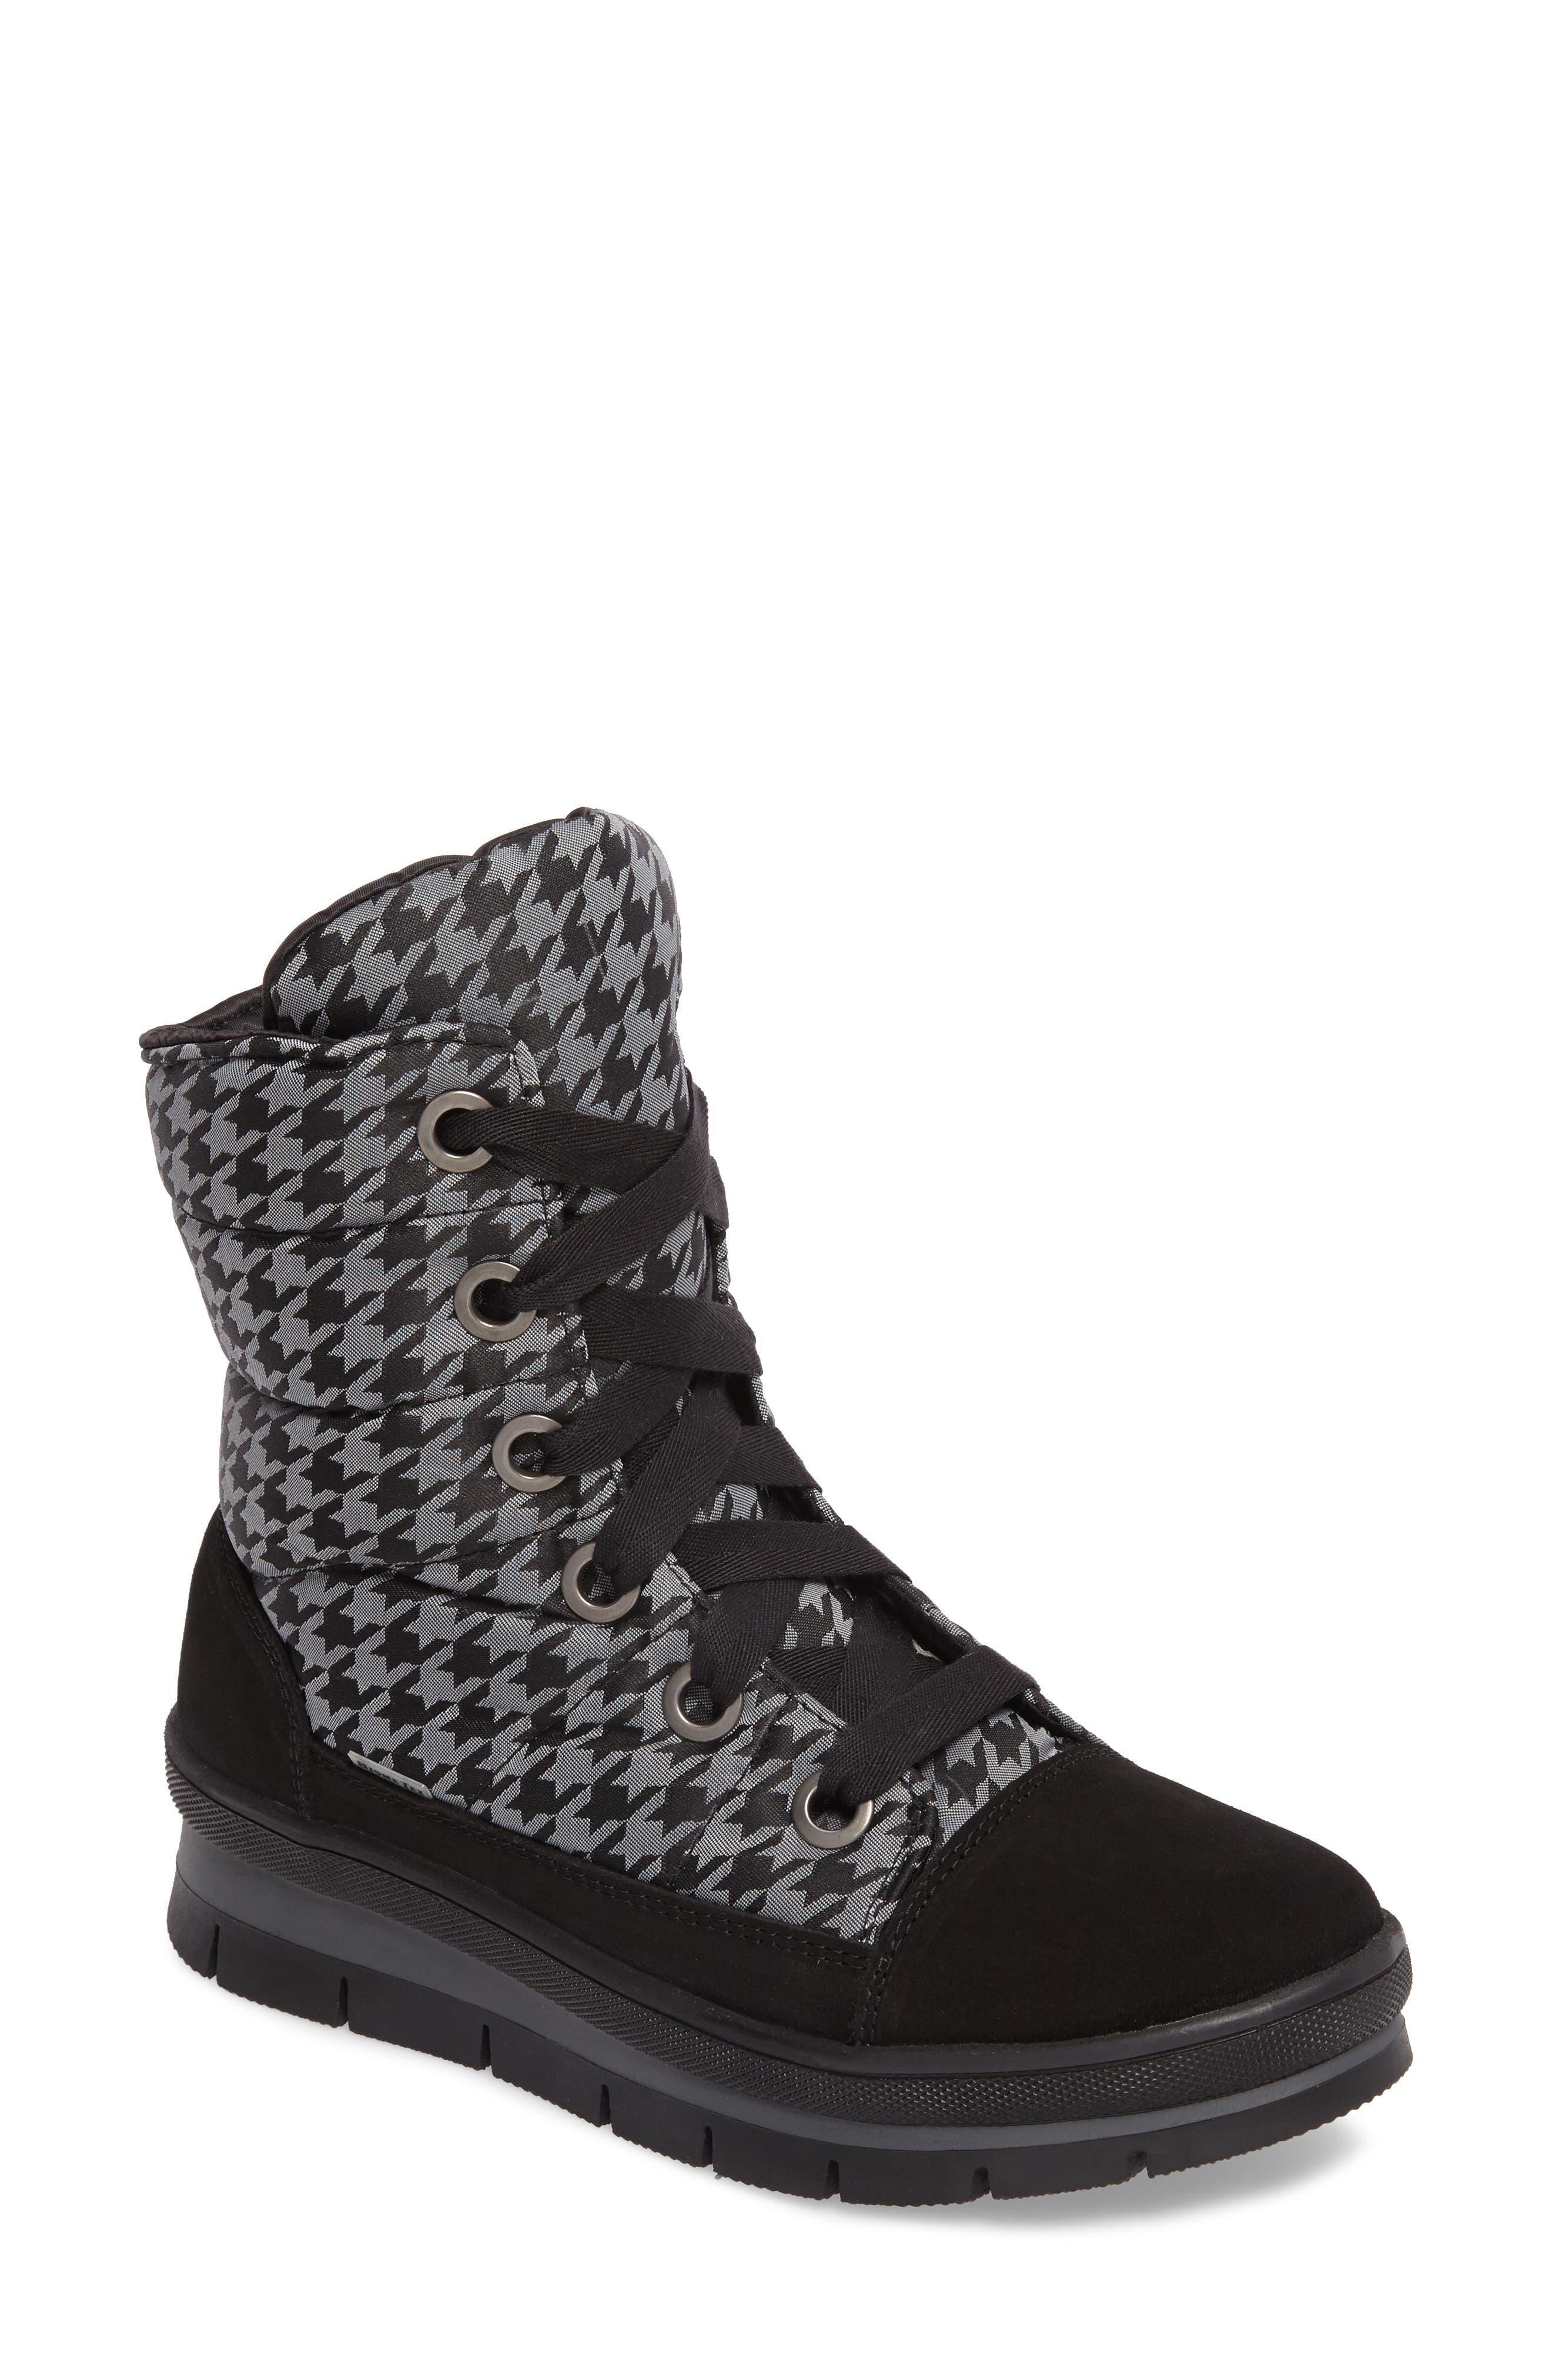 JOG DOG Meribel Waterproof Channel Quilted Lace Up Sneaker Boot (Women)